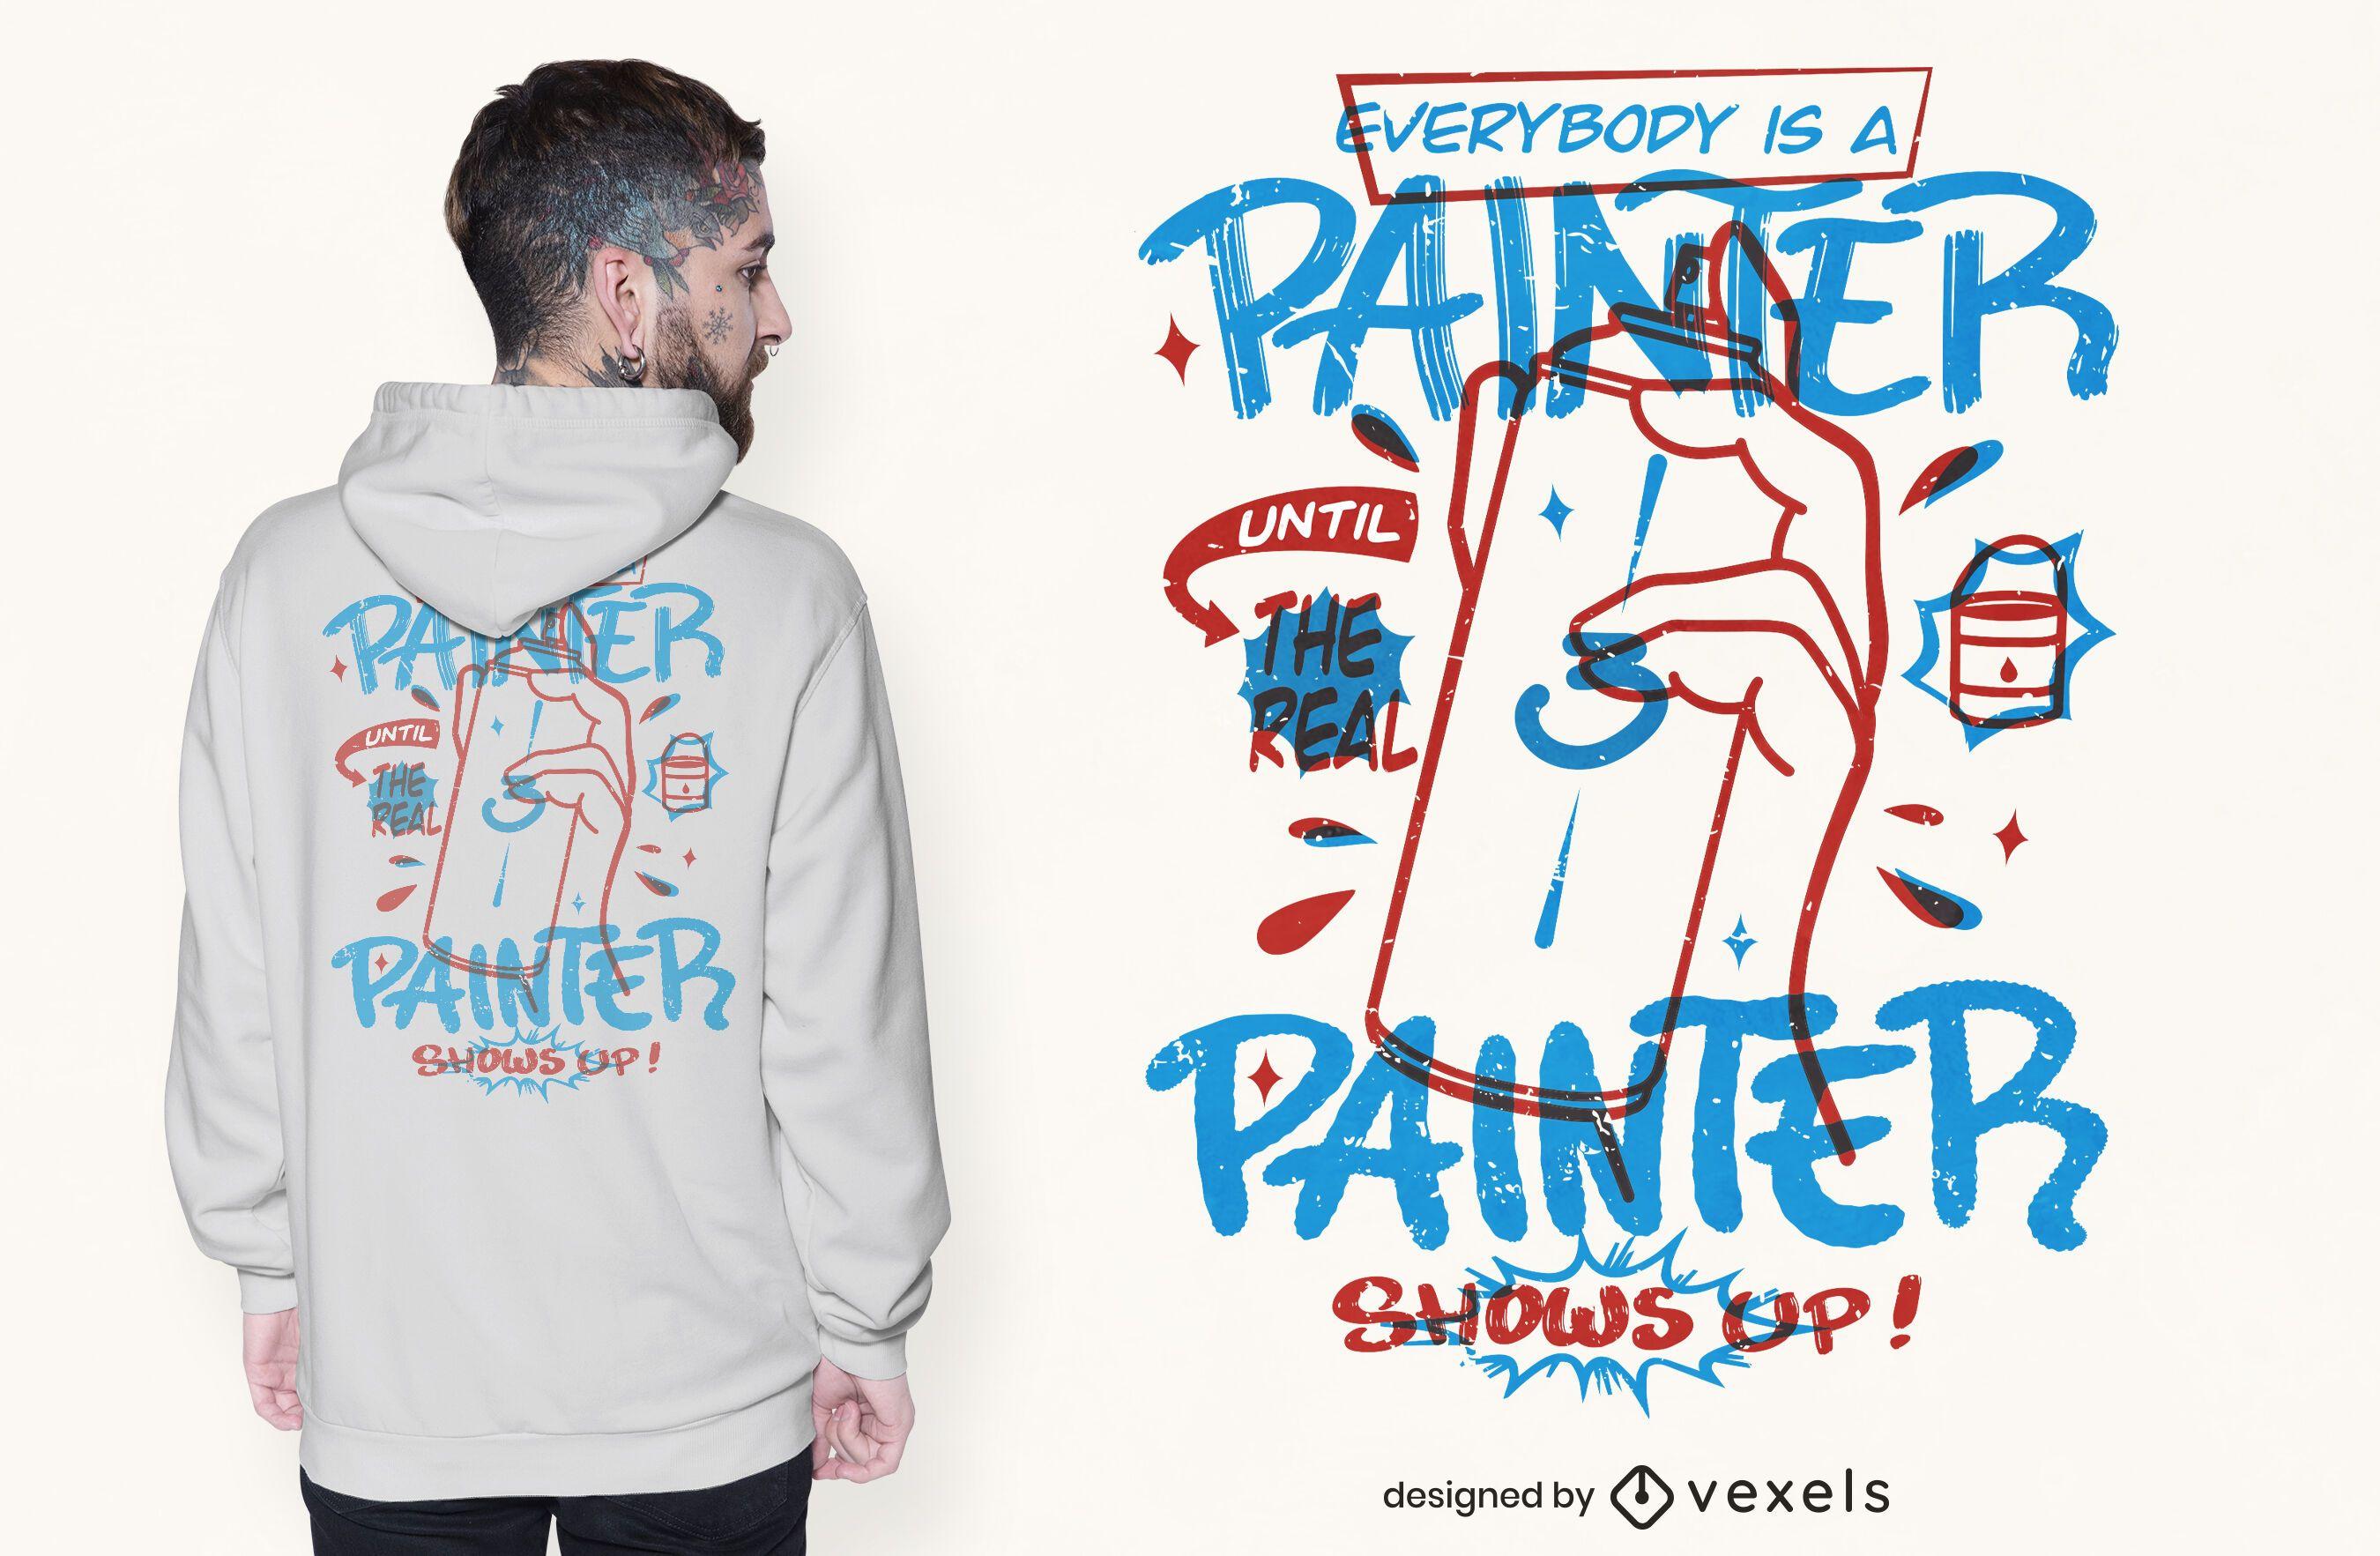 Painter quote t-shirt design